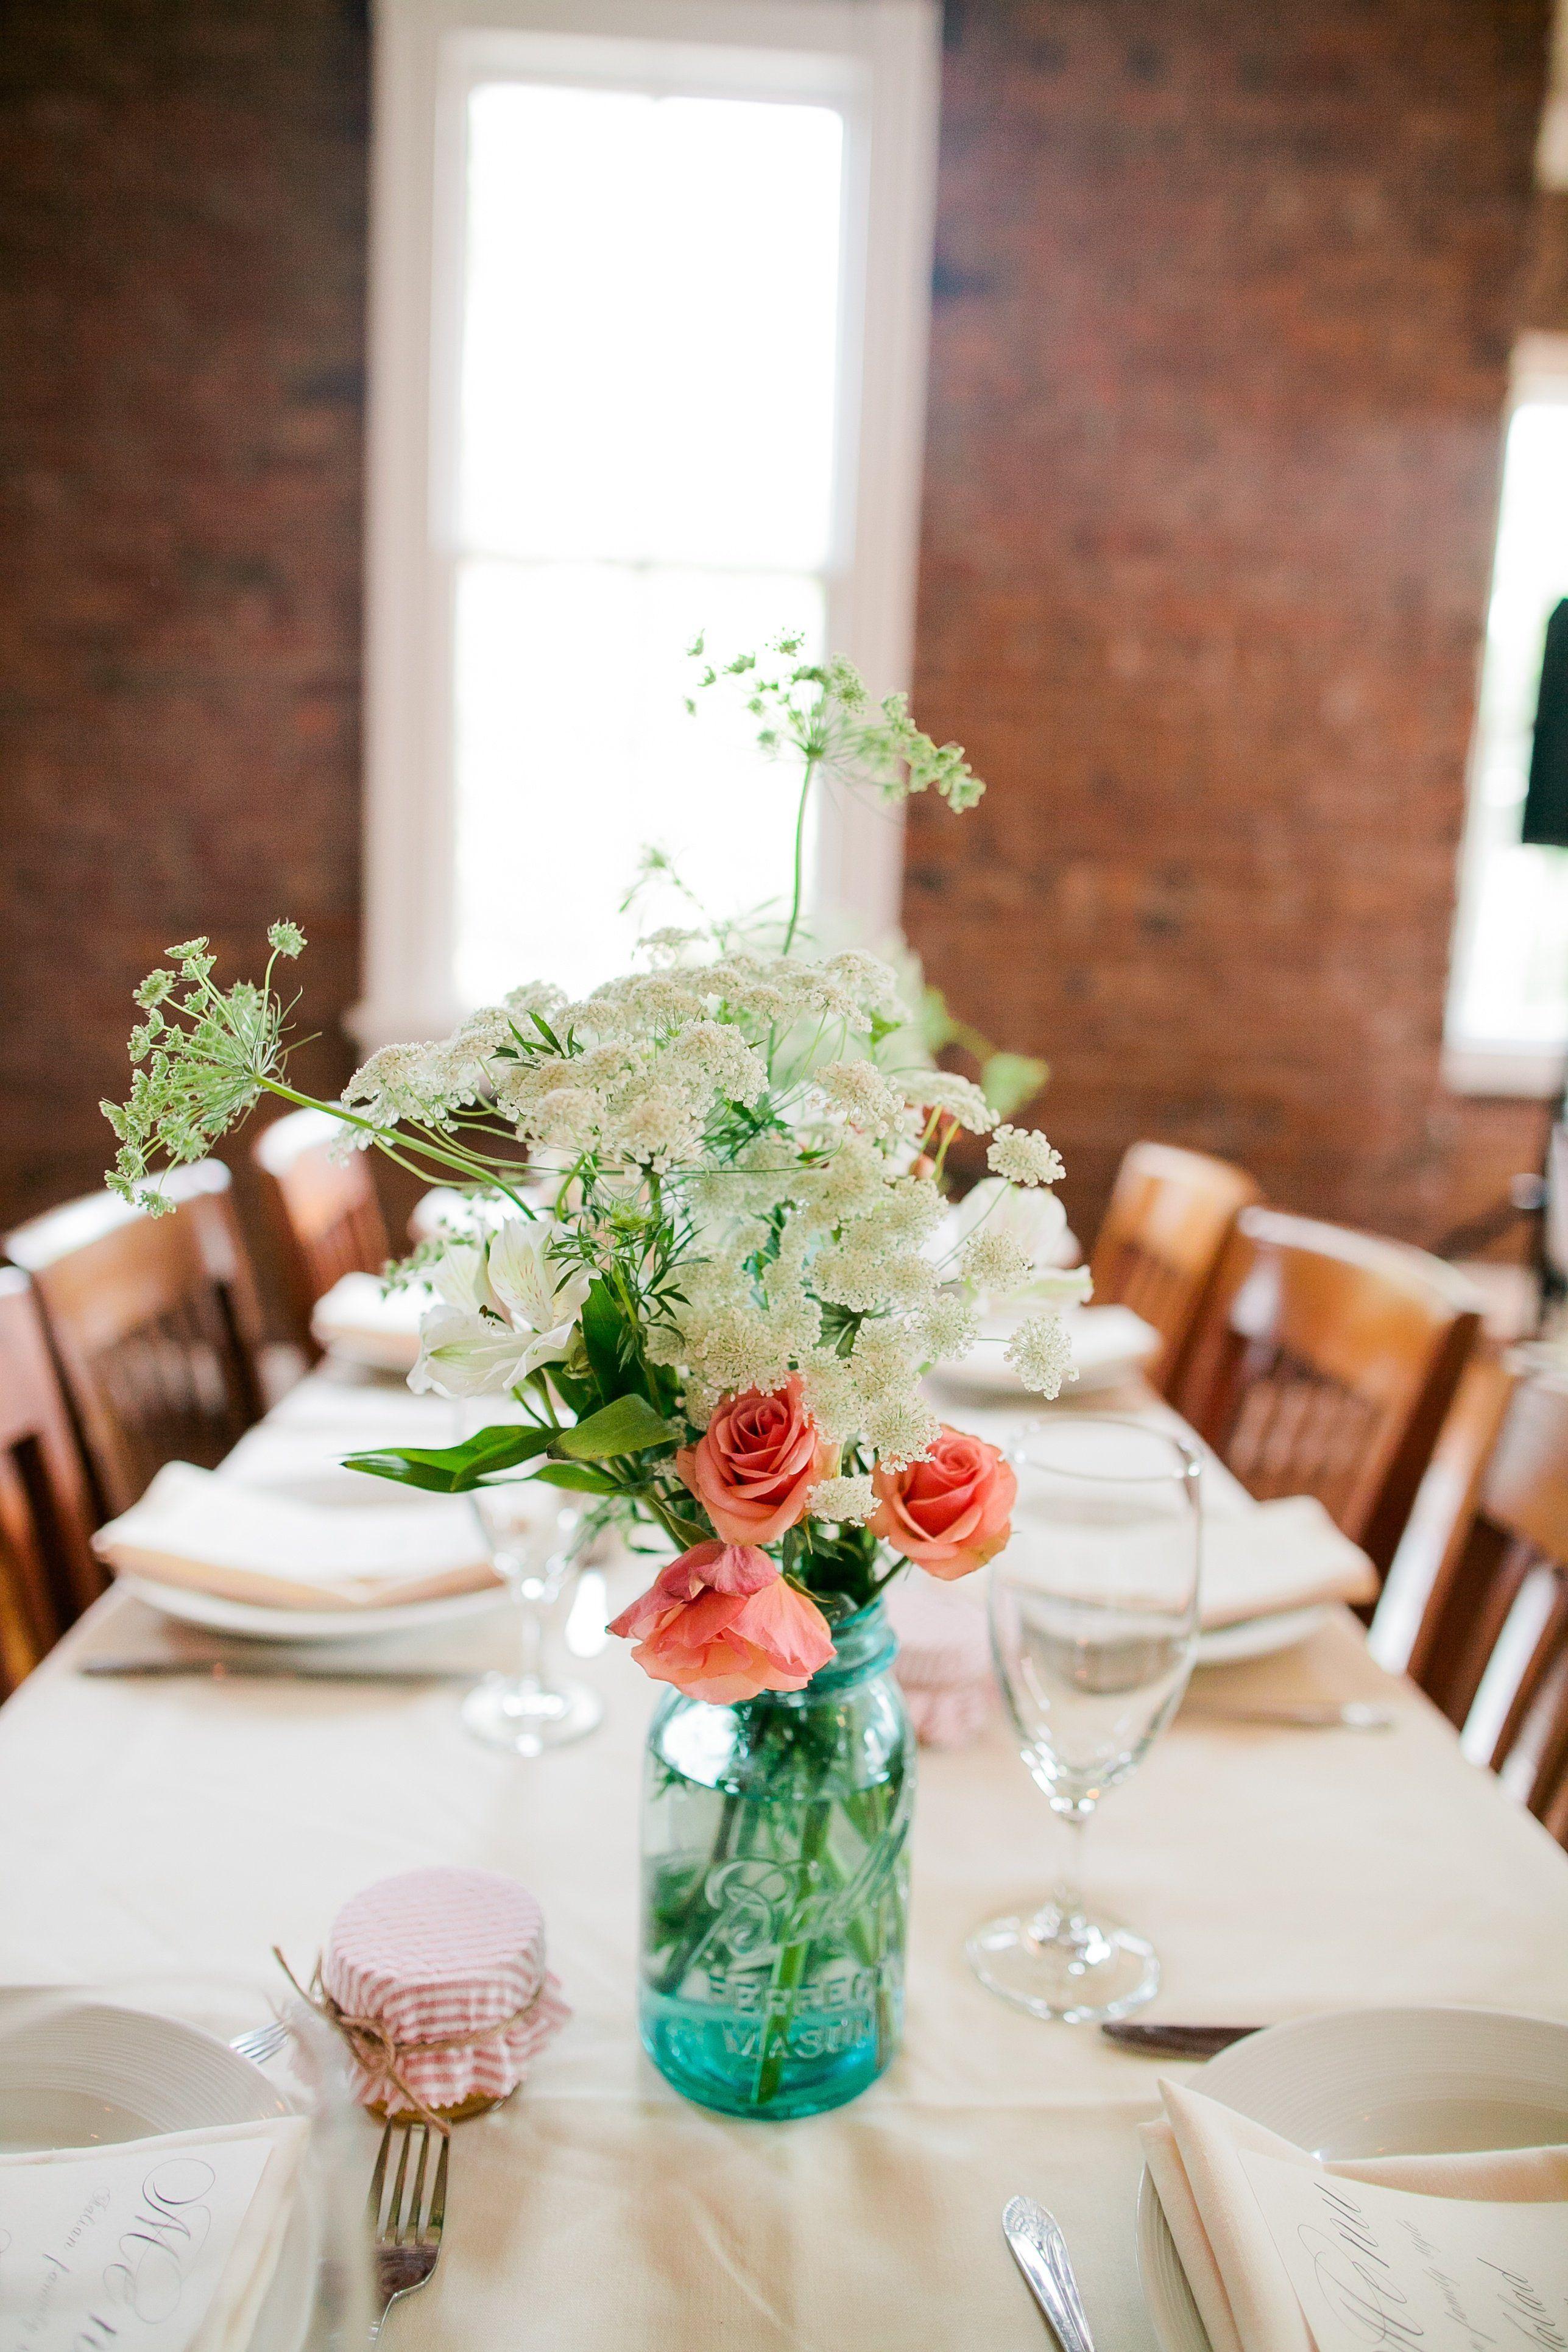 Mason Jar Wedding Decorations Queen Anne's Lace Centerpiece  Wedprep  Pinterest  Lace